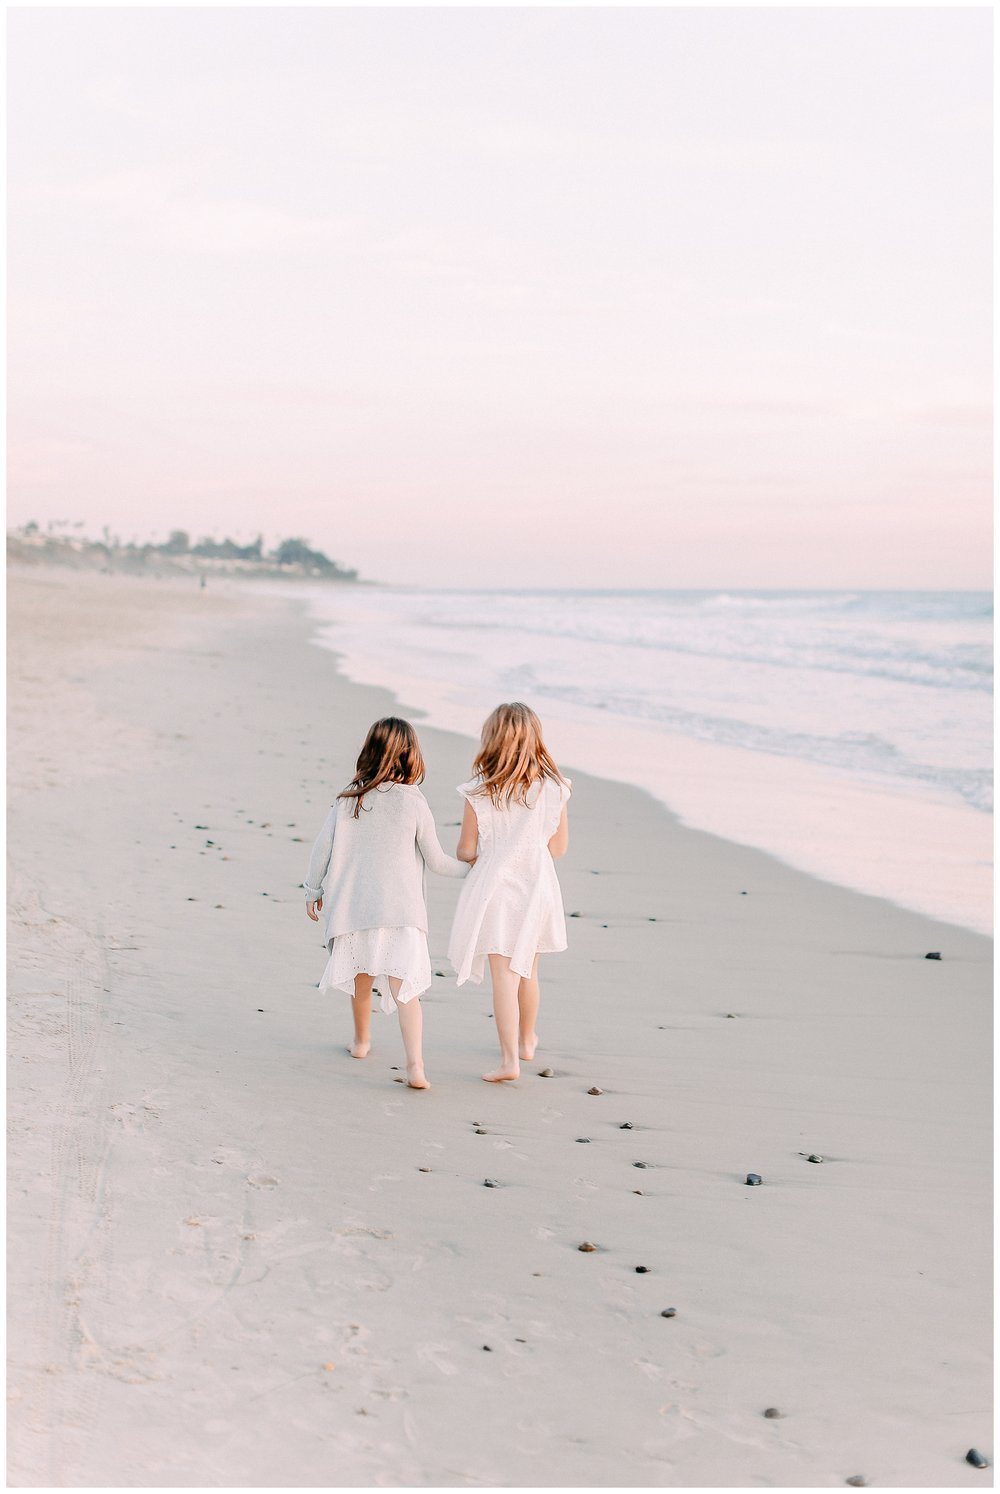 San_clemente_family_session_Orange_county_family_photographer_cori_kleckner_photography_laguna_beach_family_session_0712.jpg